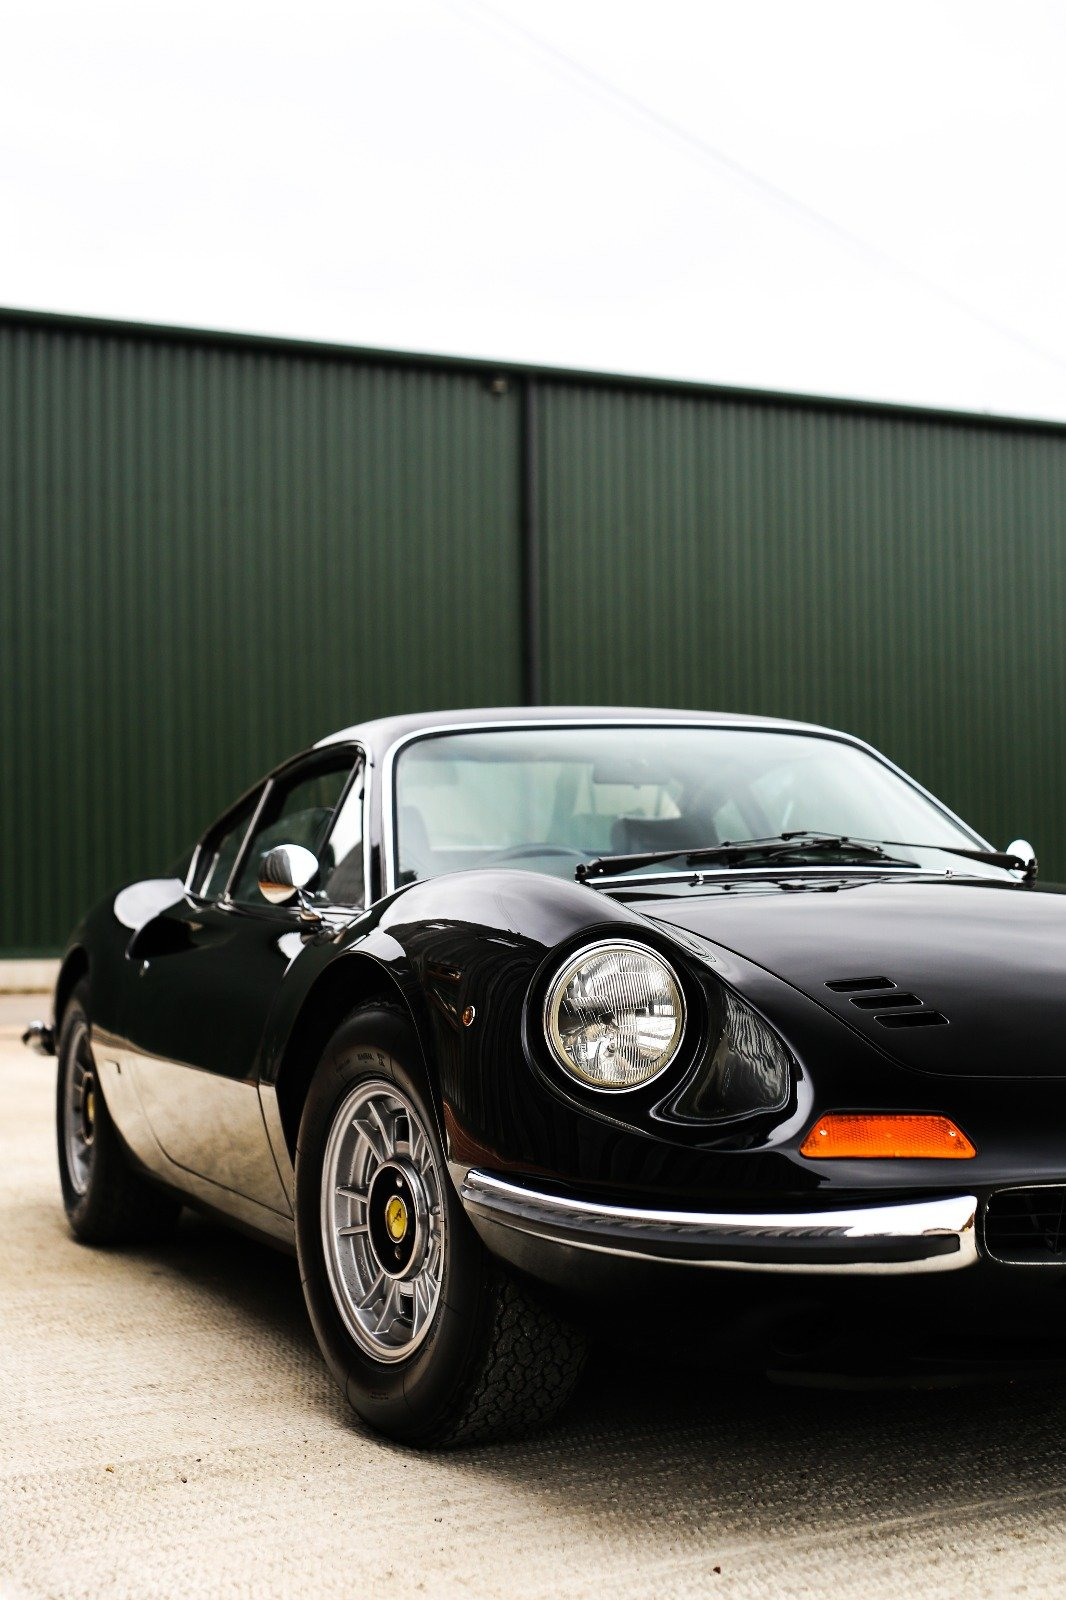 1974 Ferrari 246 GT 'Dino' UK RHD (Nero Black 1 of 63) For Sale (picture 1 of 6)